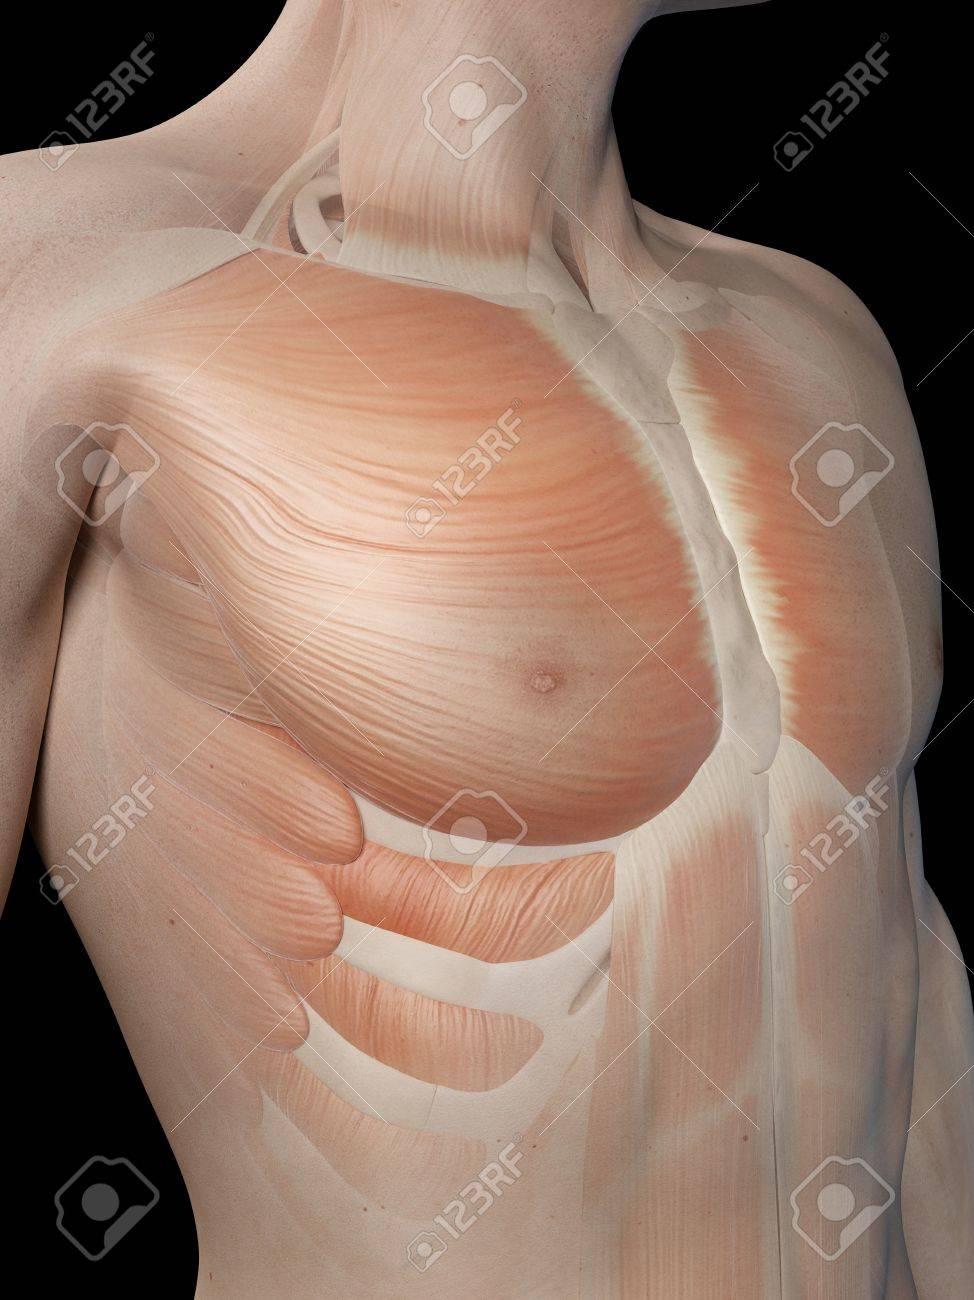 Moderno Diagrama De Pecho Humana Viñeta - Anatomía de Las ...